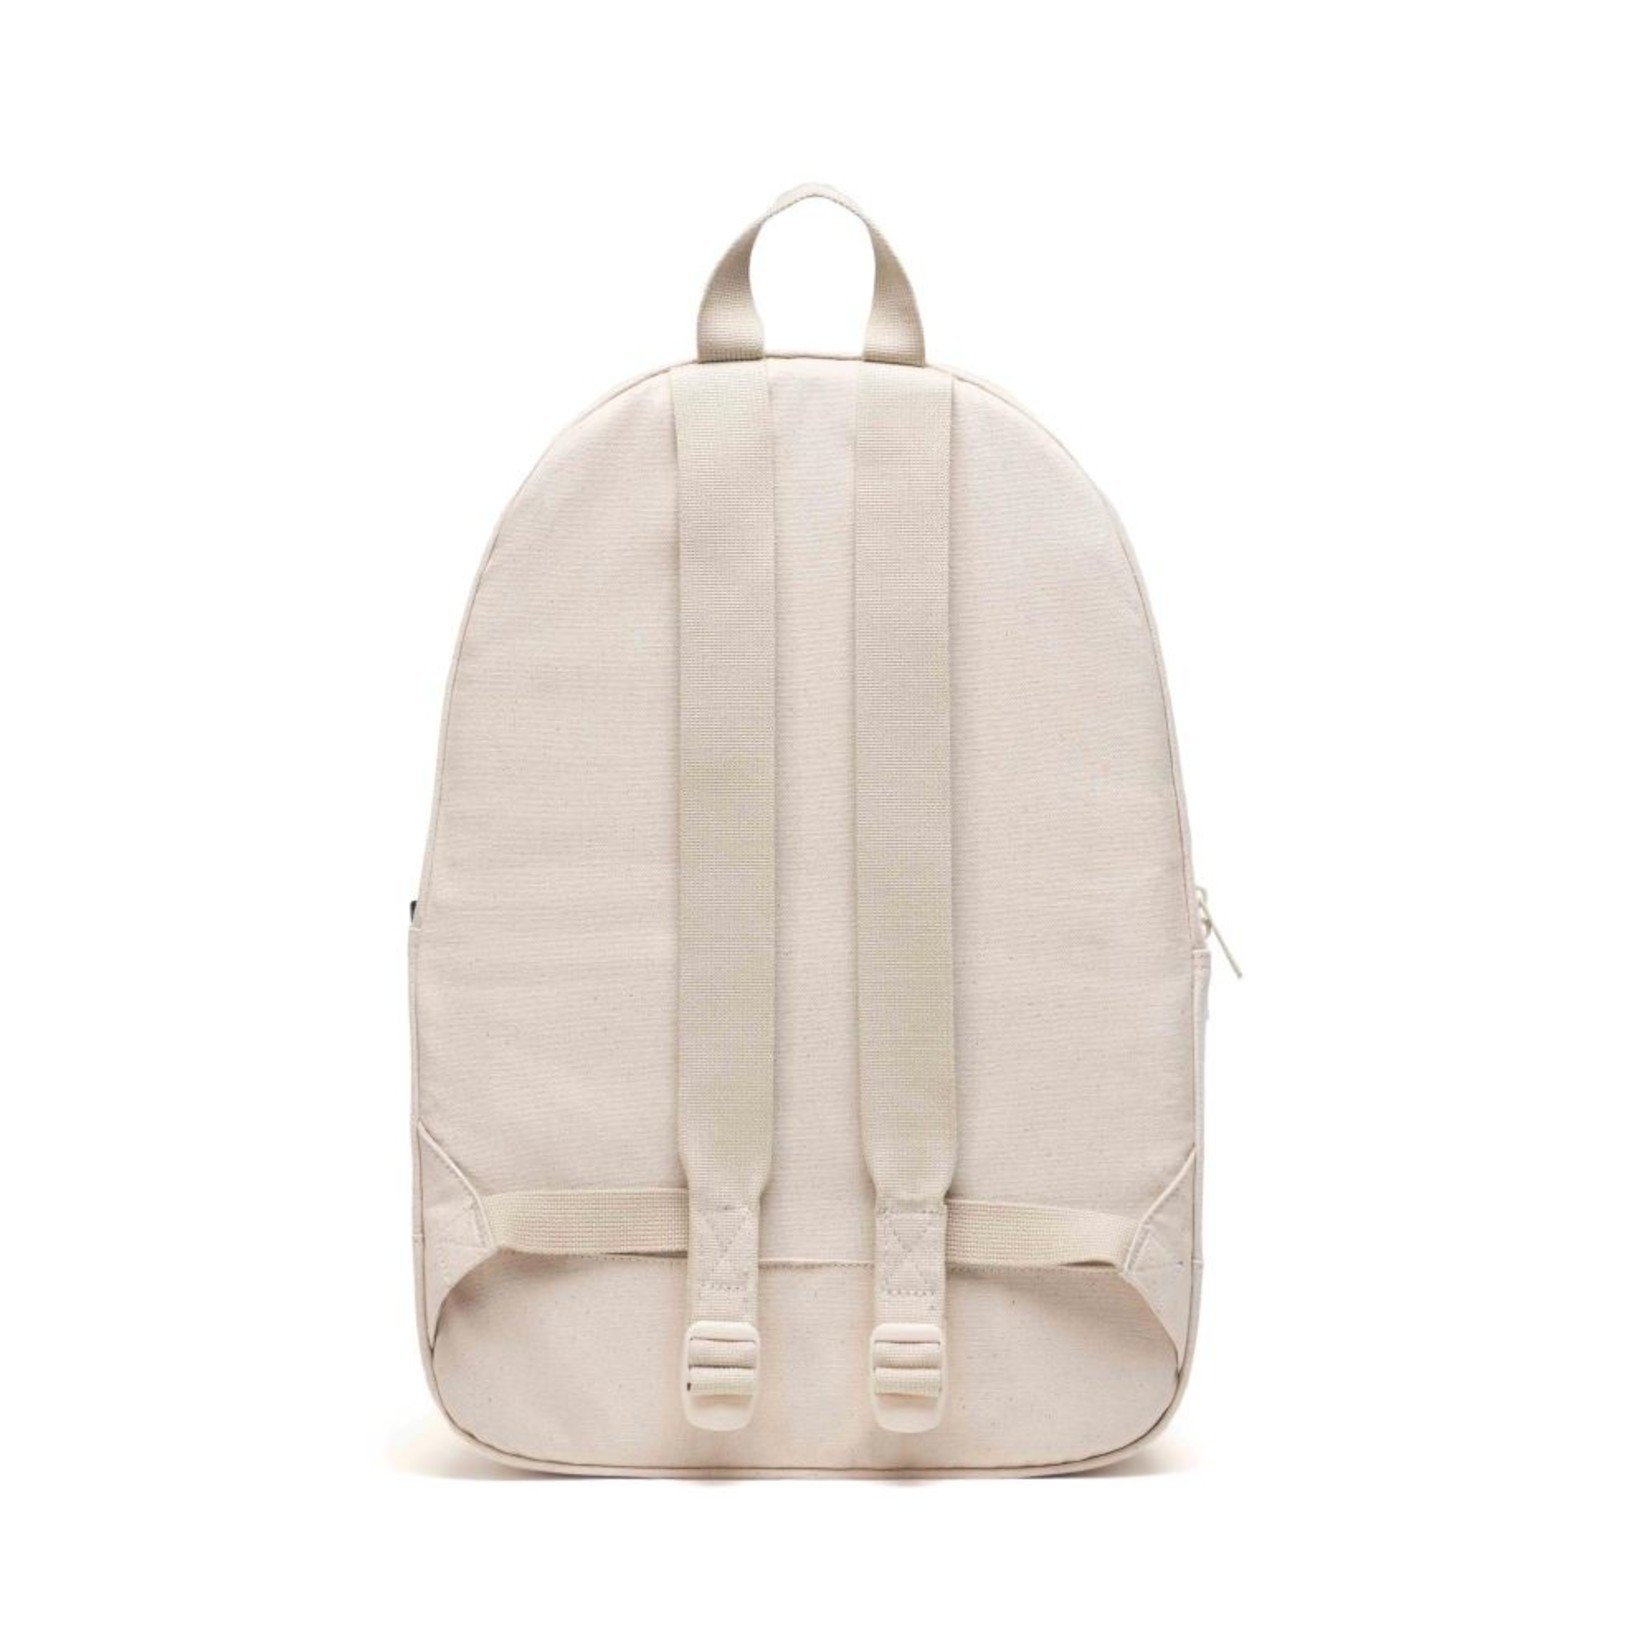 Herschel Cotton Casuals I Daypack natural